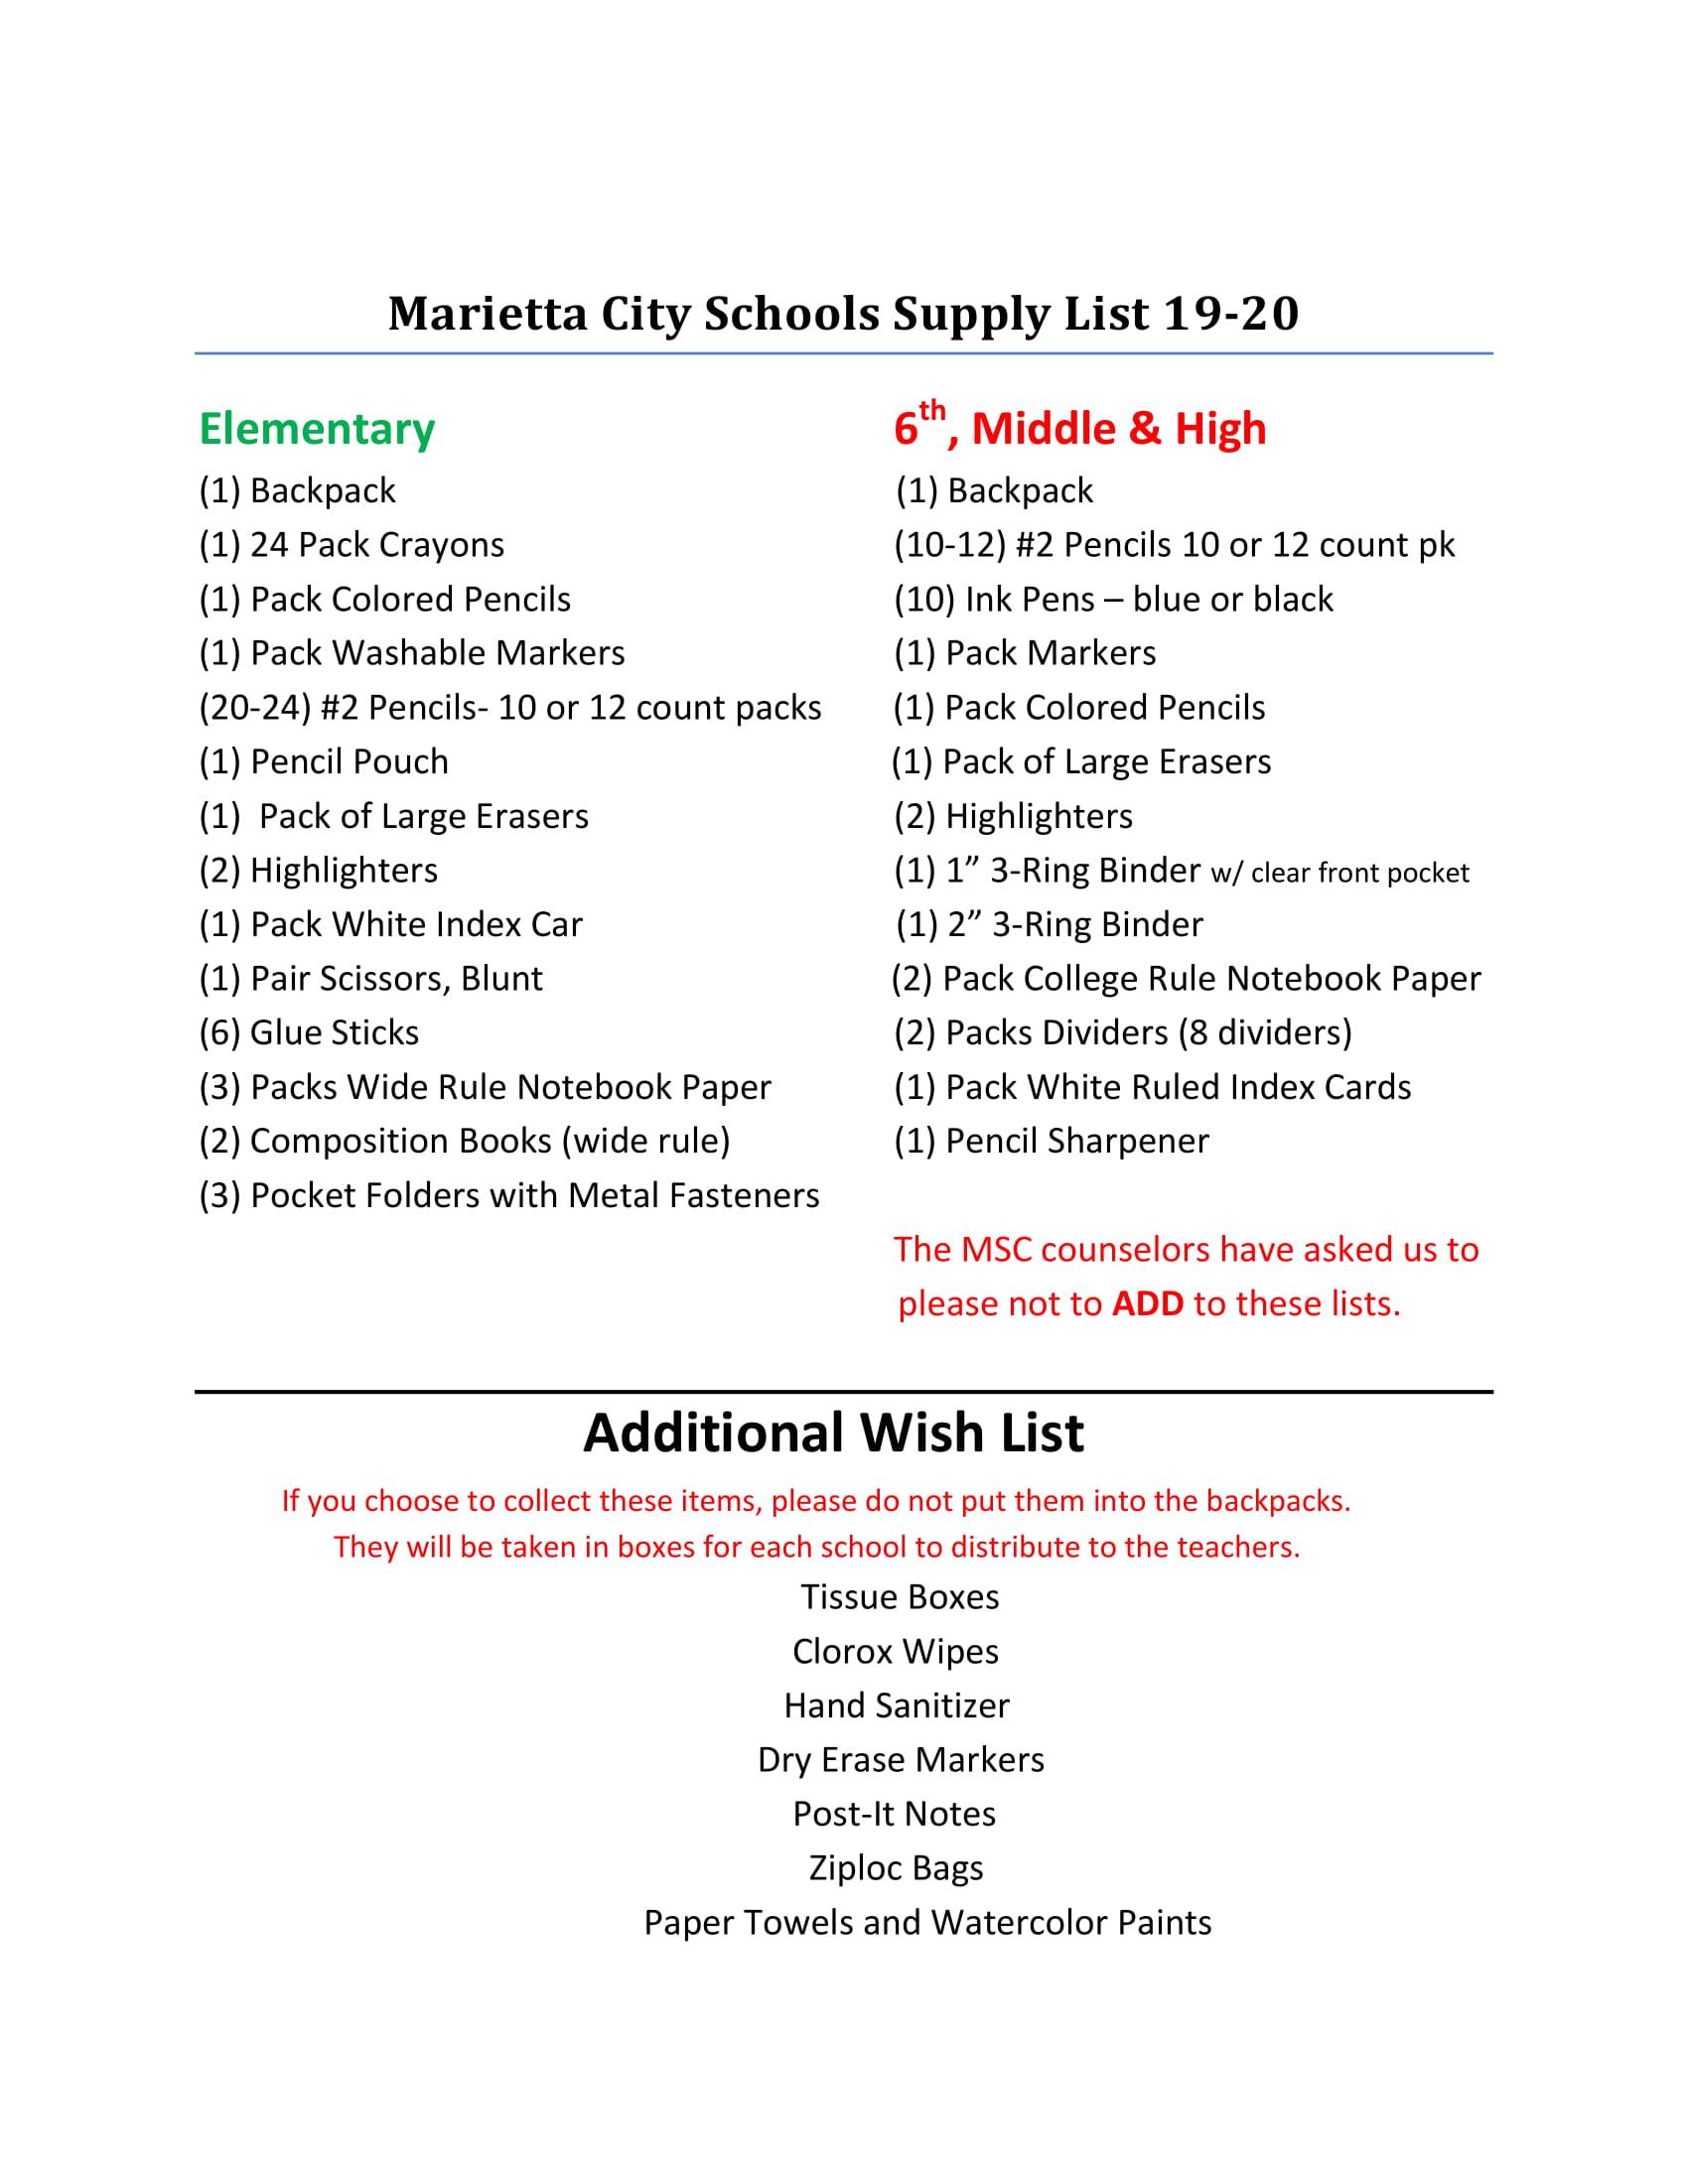 School Supply List 2019-2020 other-1.jpg